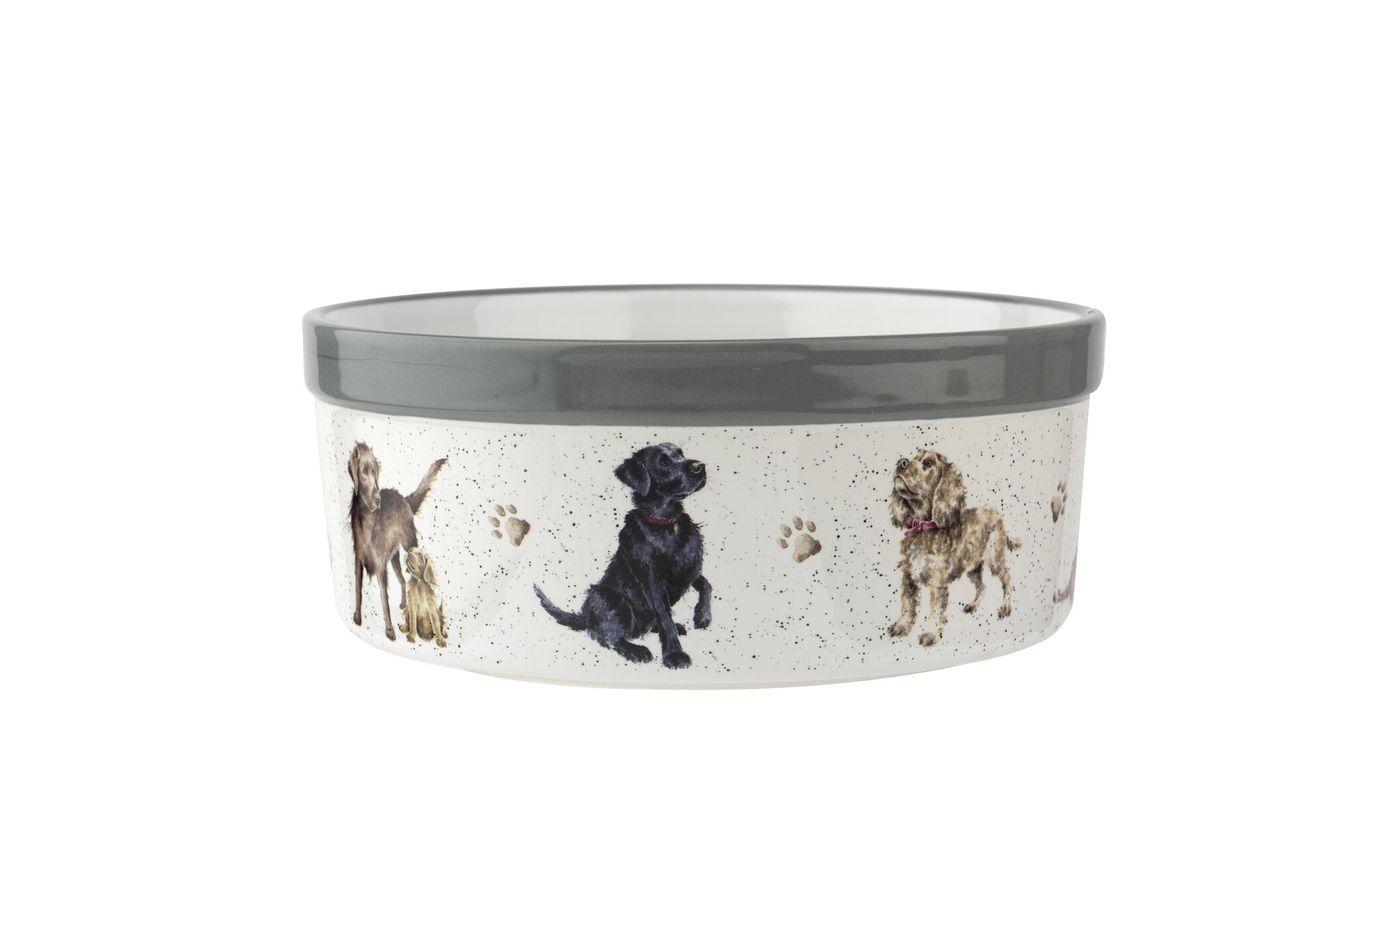 Royal Worcester Wrendale Designs Pet Bowl 20cm thumb 2